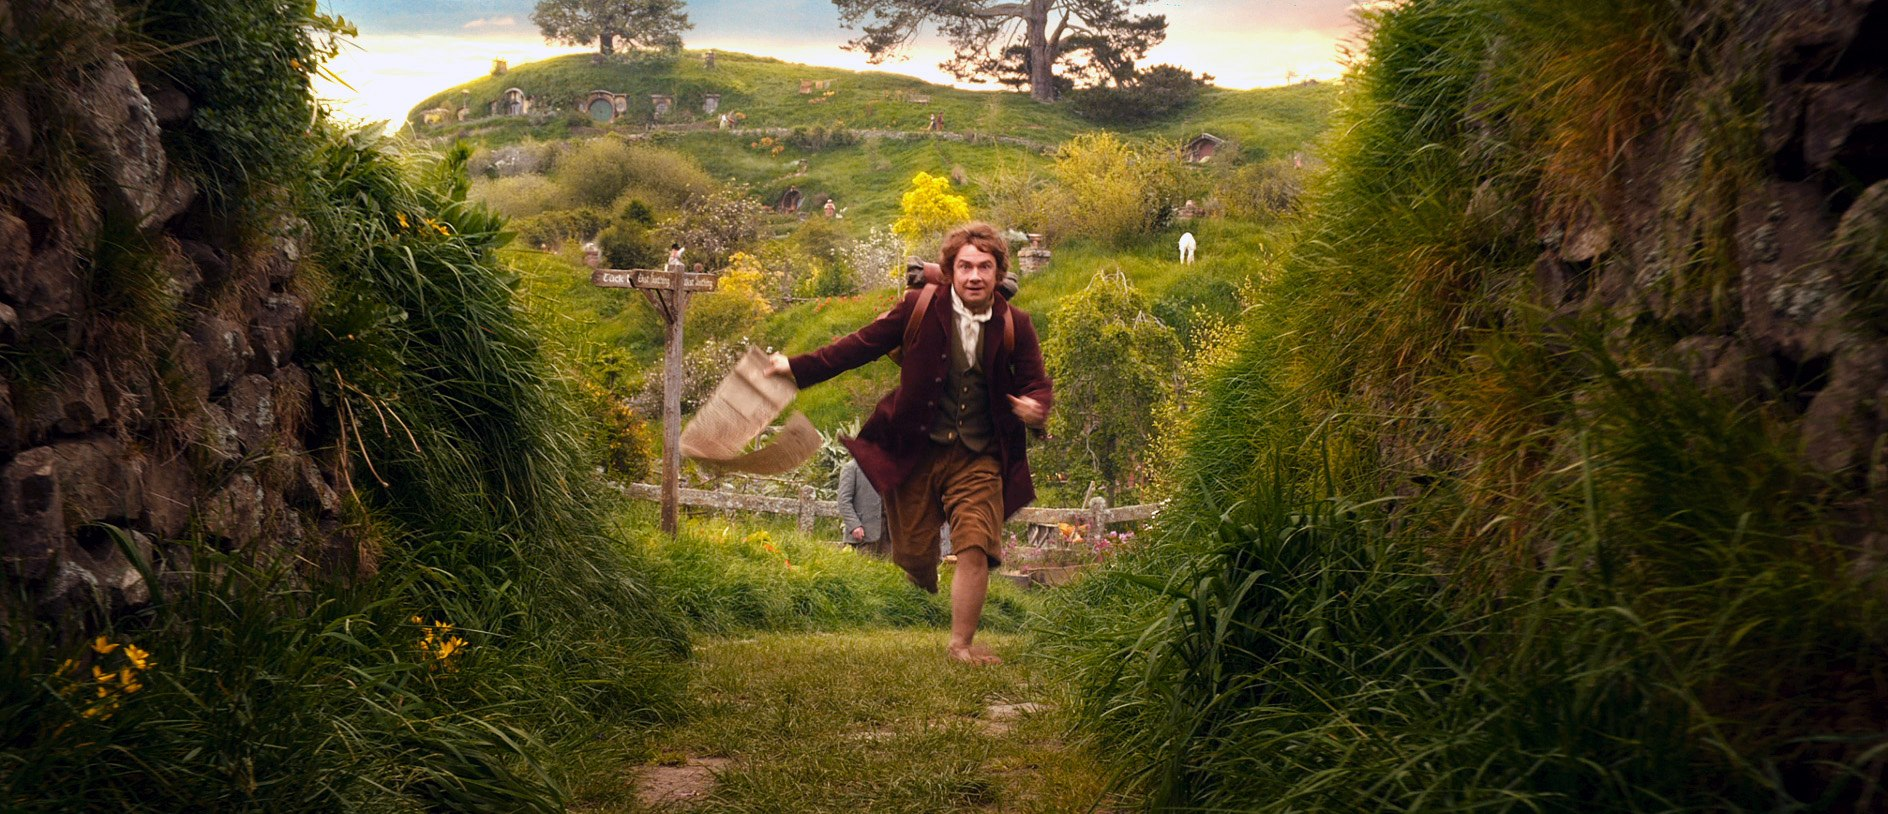 Bilbo-Baggings-going-on-an-adventure.jpg